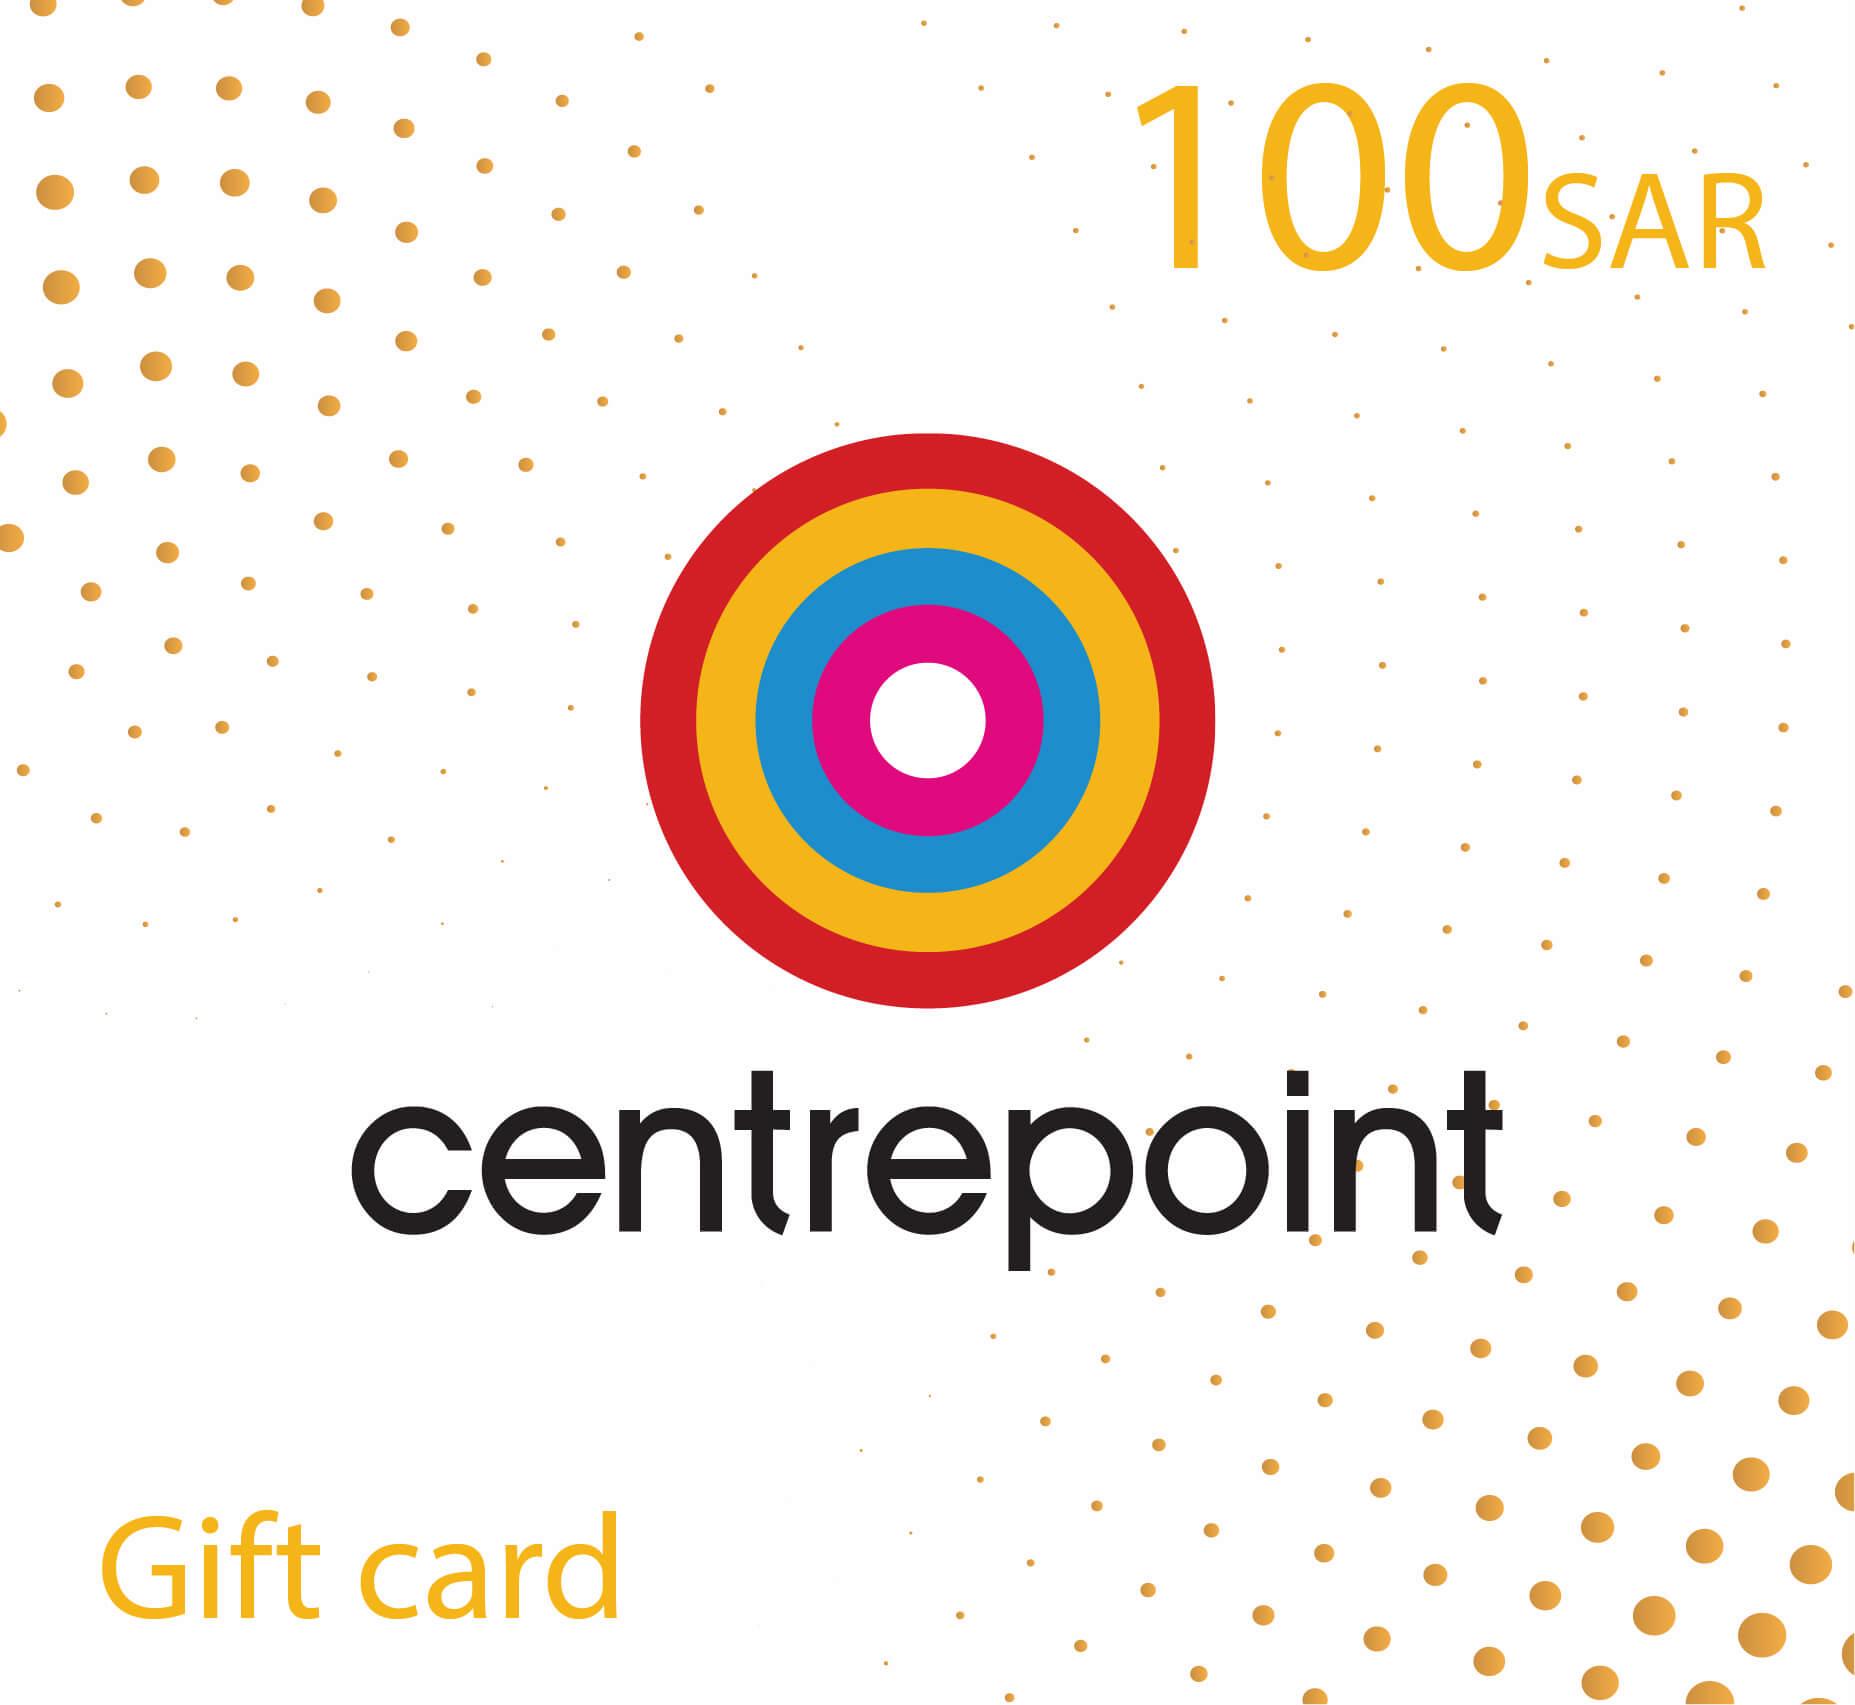 CentrePoint Gift Card - 100 SAR